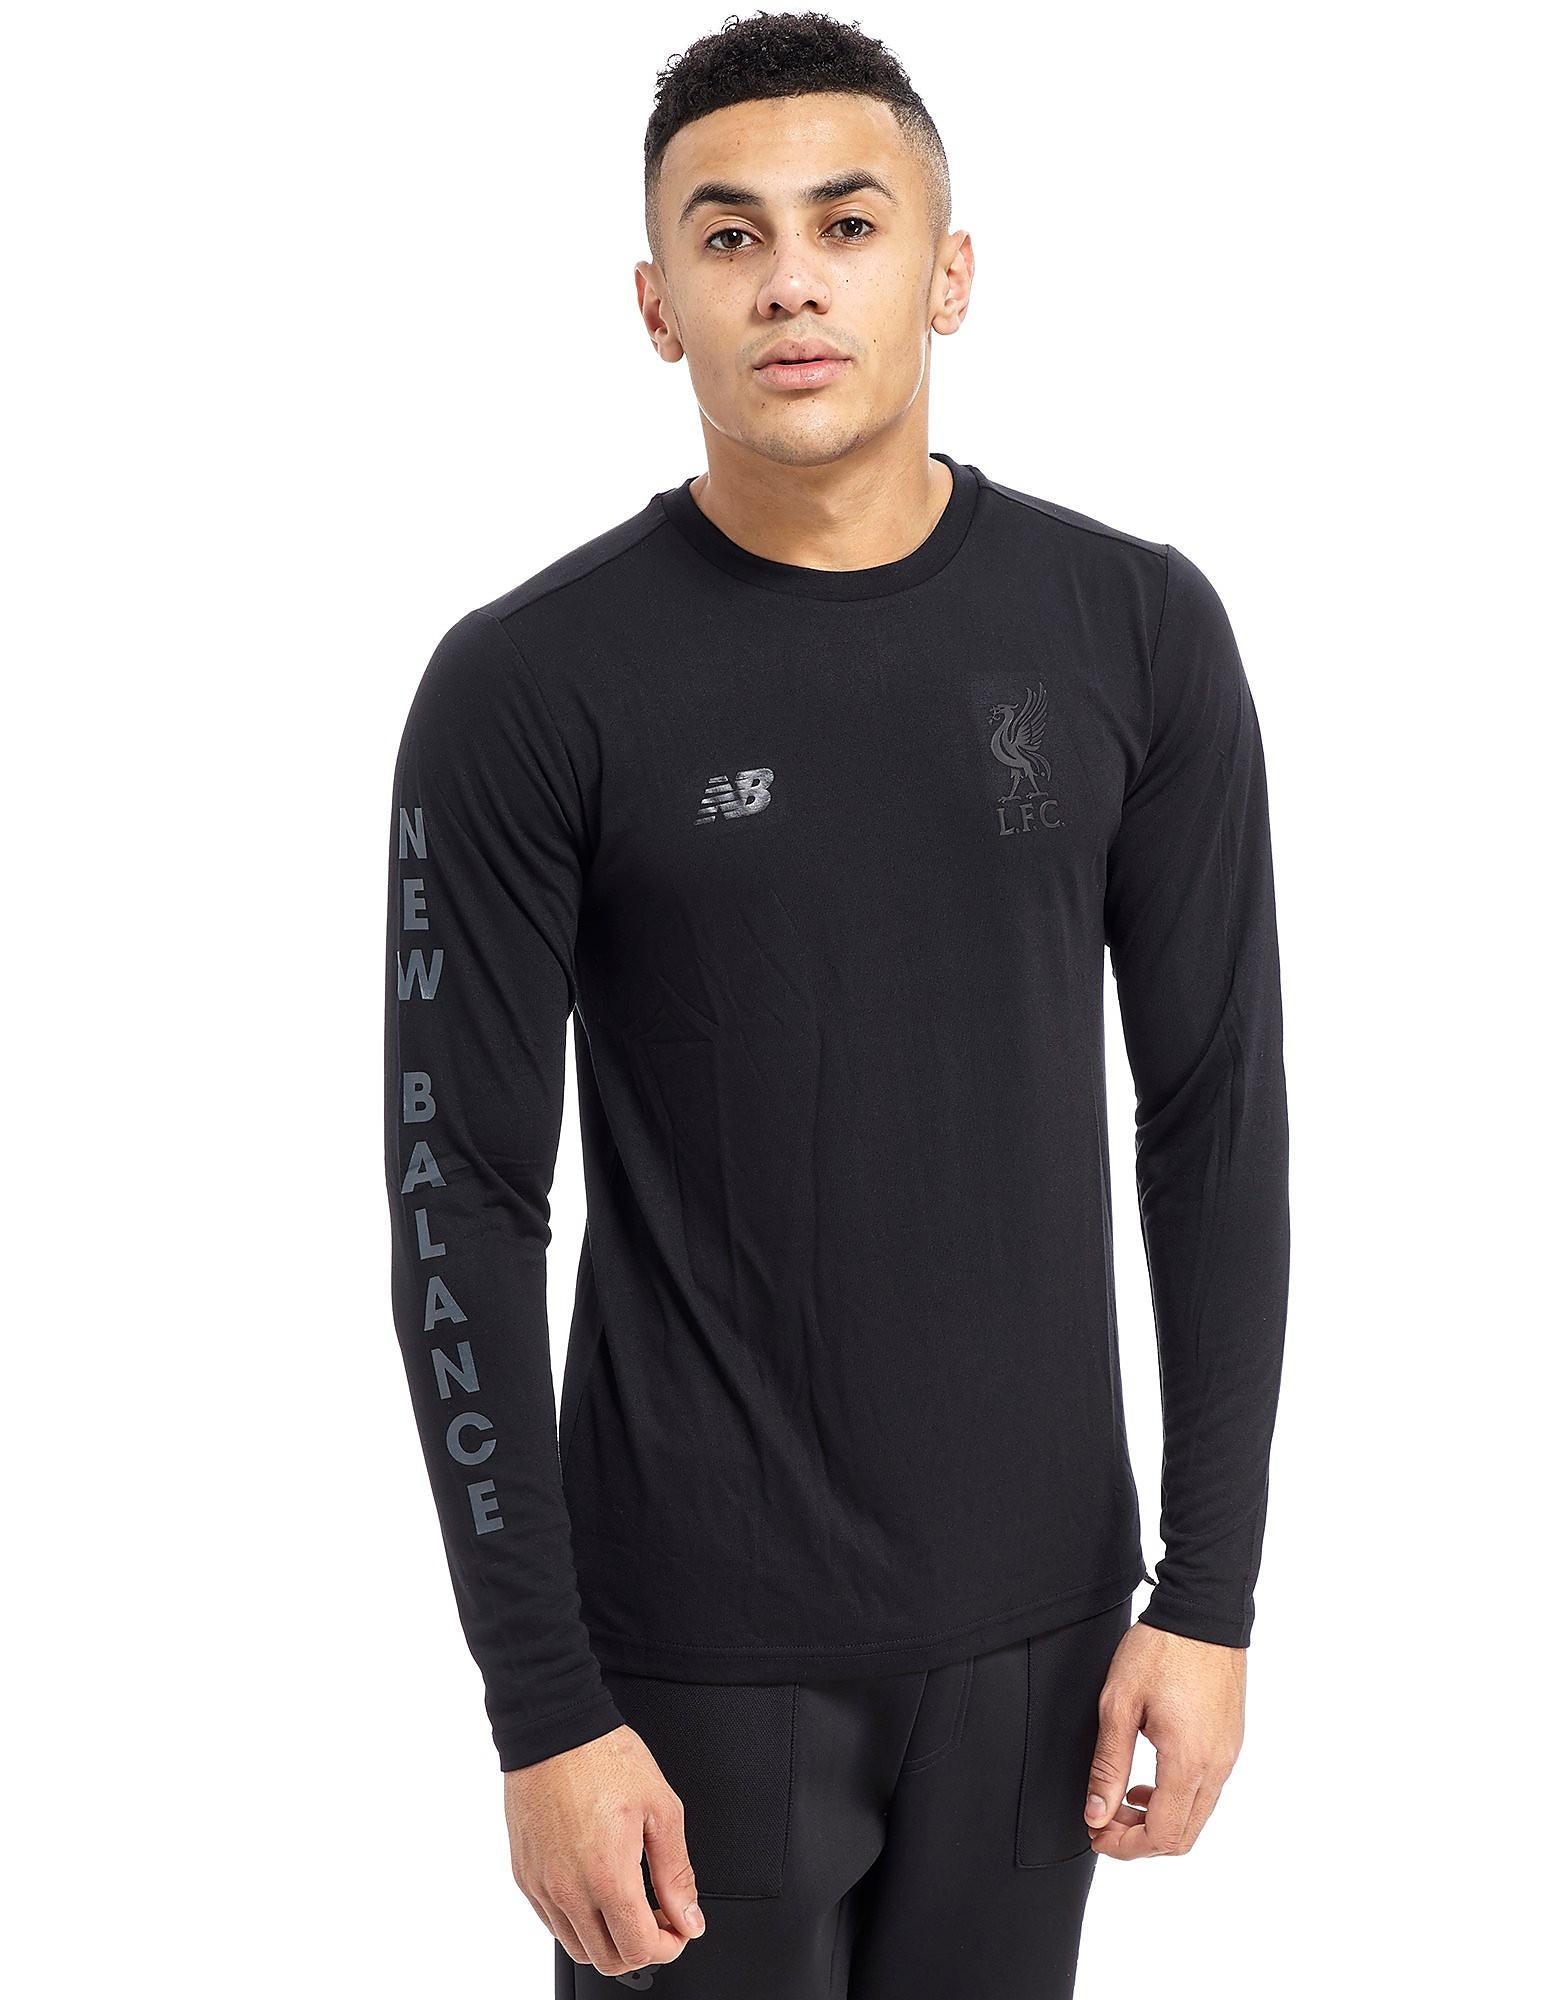 New Balance 247 Liverpool FC Long Sleeve T-Shirt - Black, Black